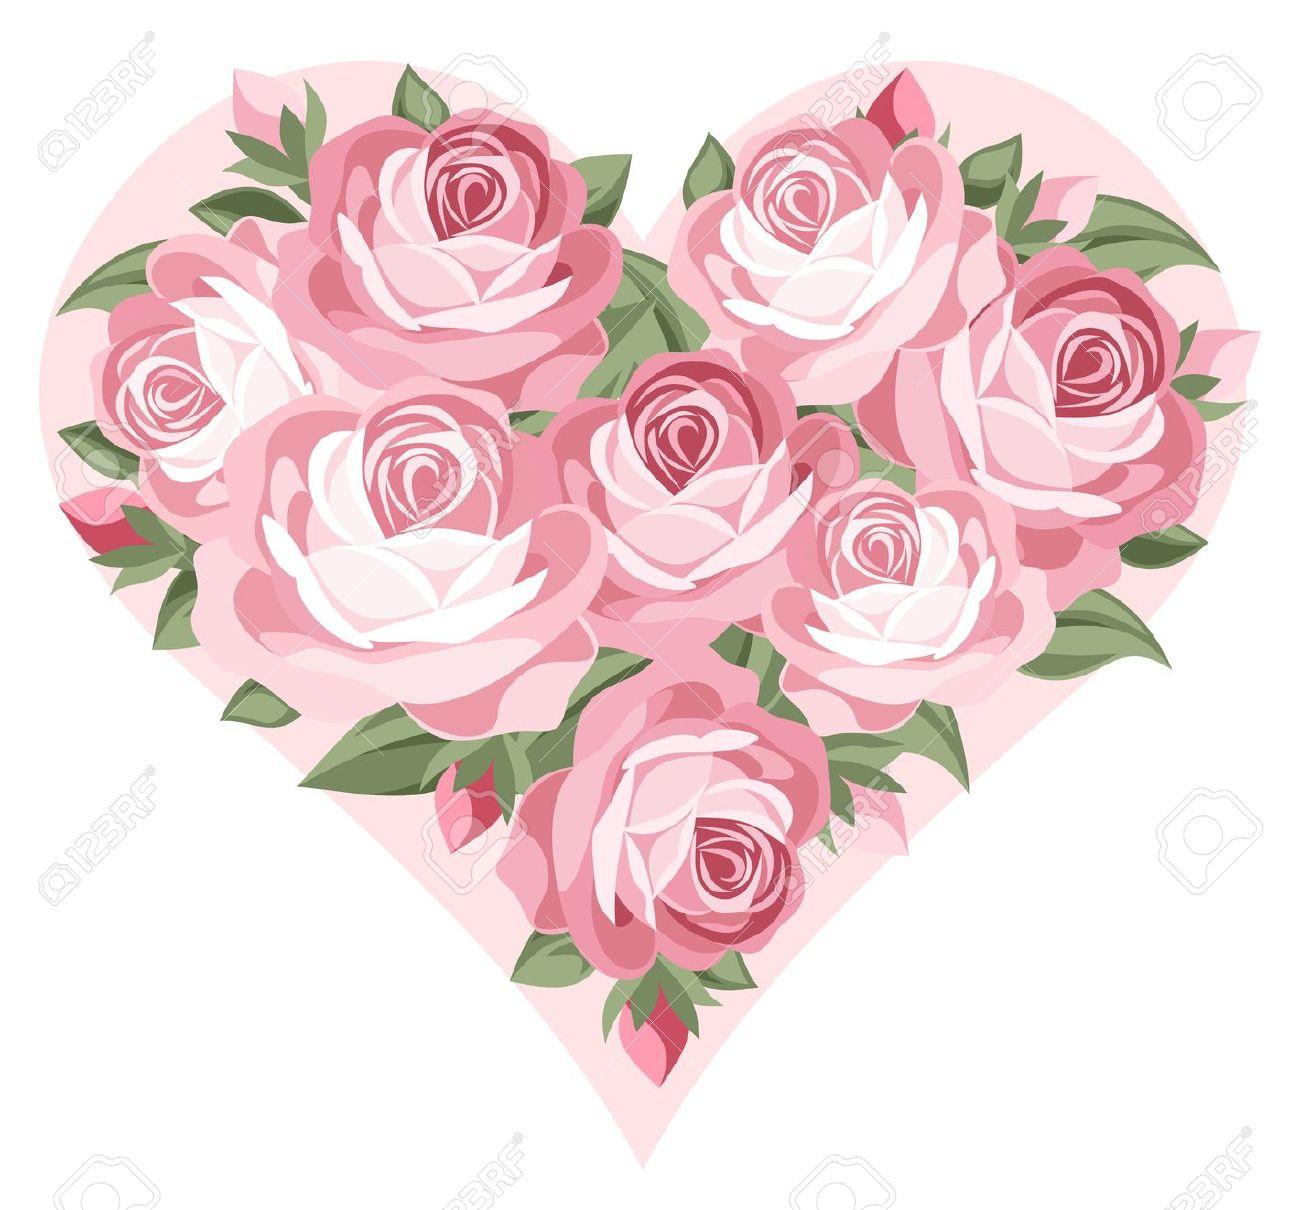 Pink Rose clipart pink heart Pinterest  Heart Roses roses